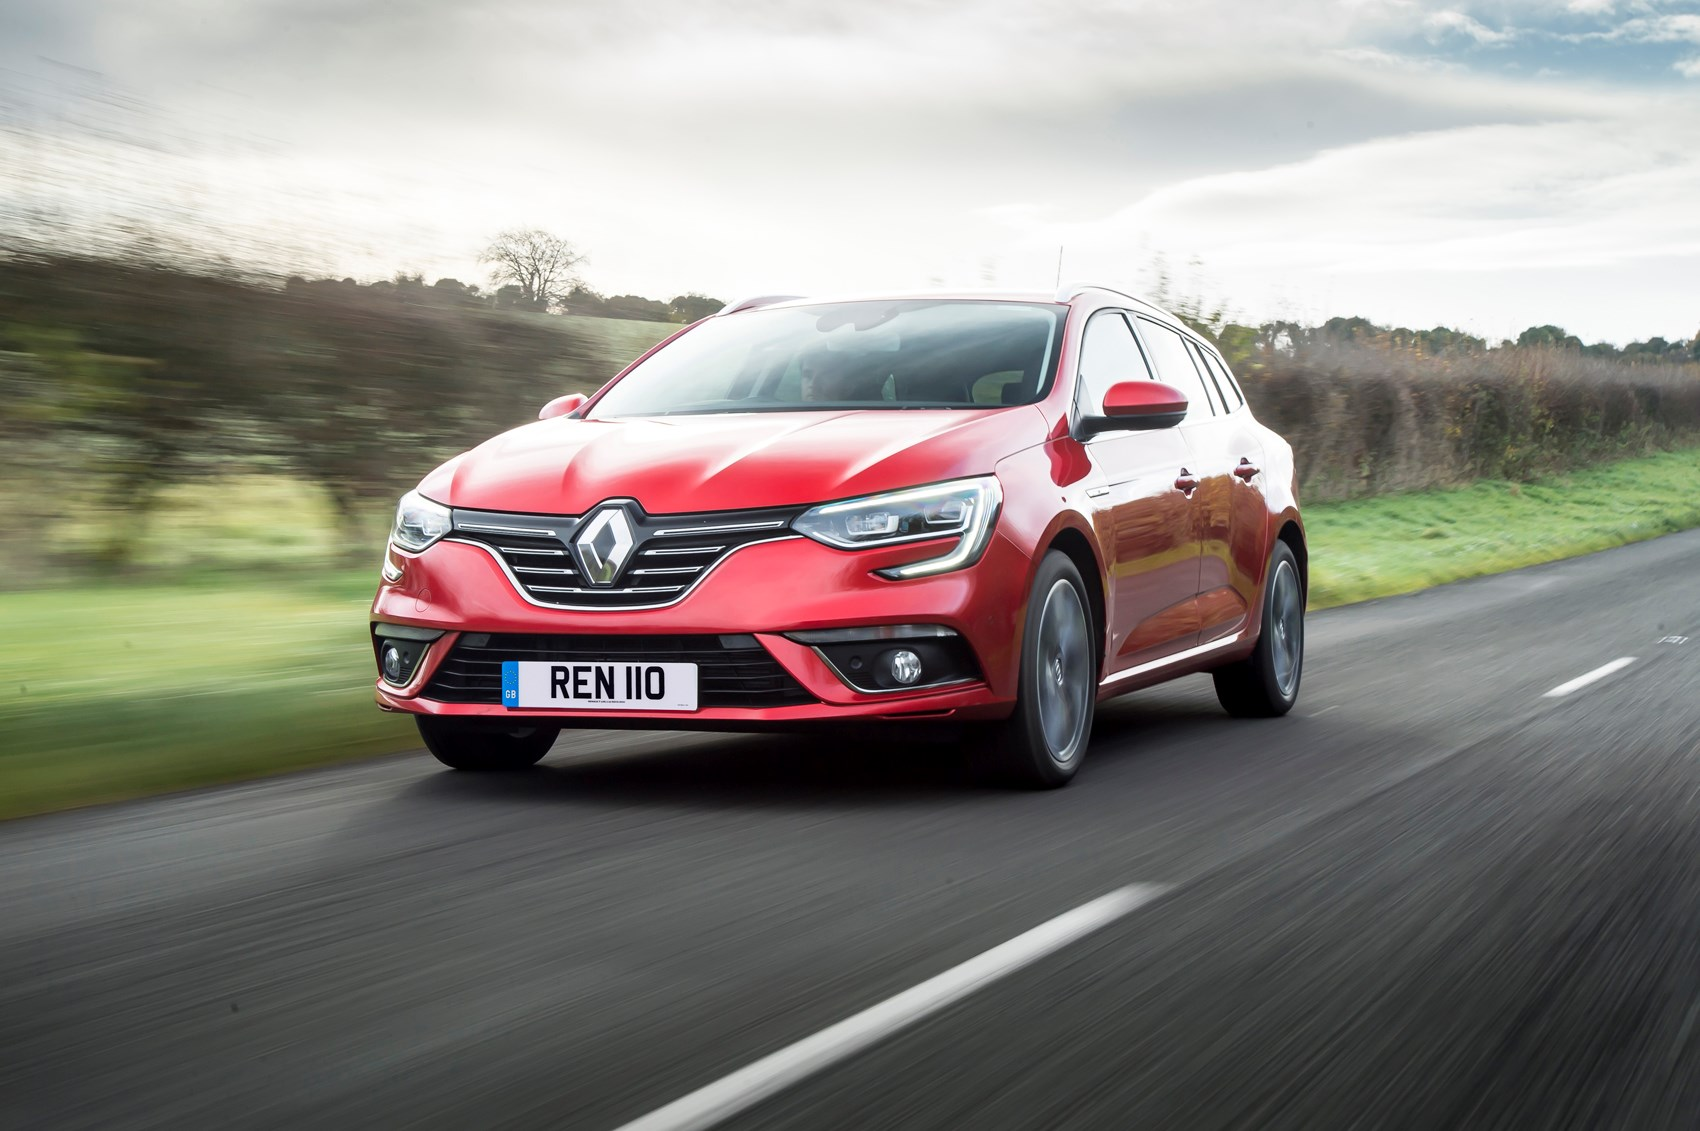 Renault Megane Sport Tourer (2019) Practicality & Boot Space